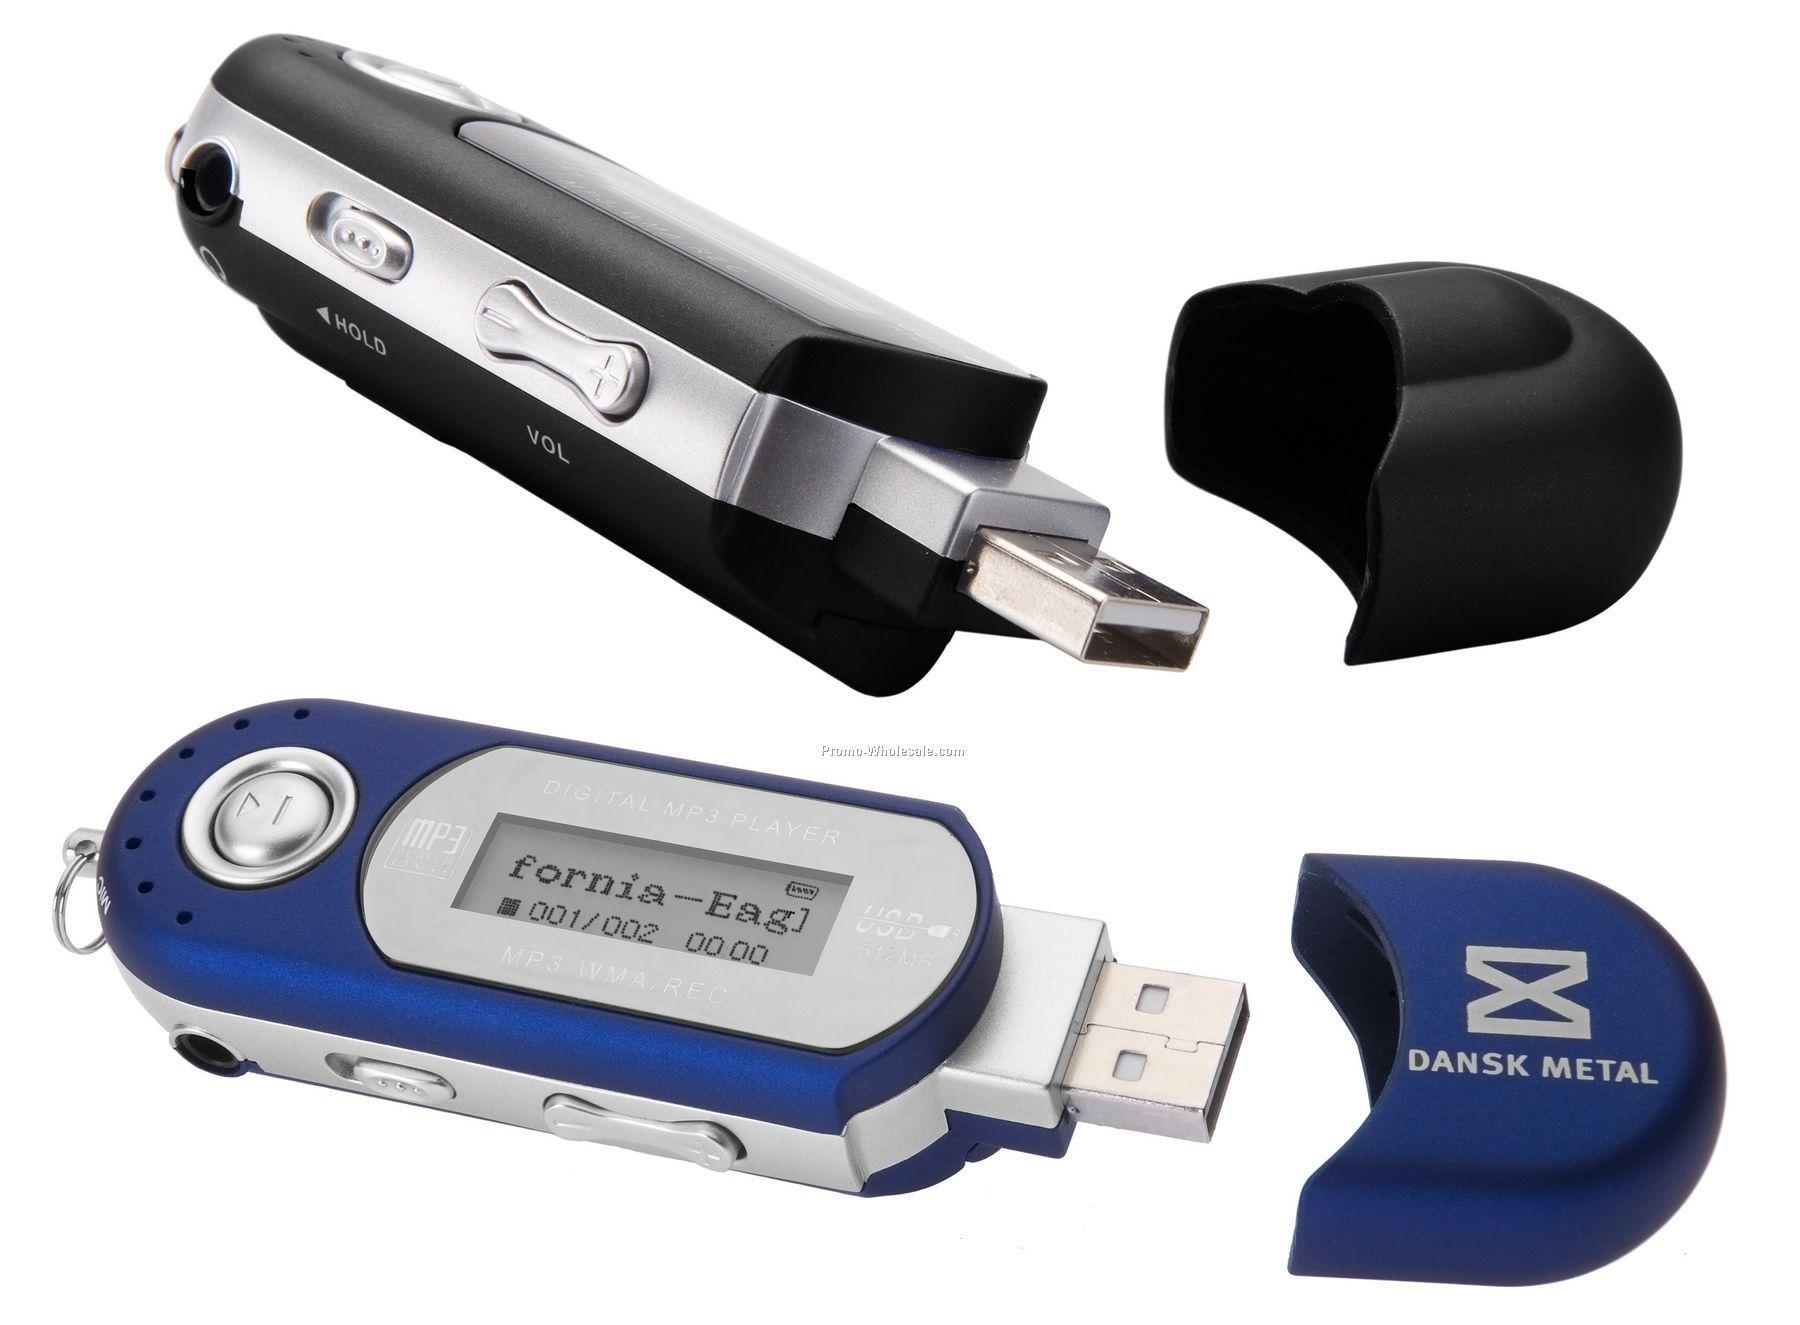 limbo mp3 player usb flash drive wholesale china. Black Bedroom Furniture Sets. Home Design Ideas